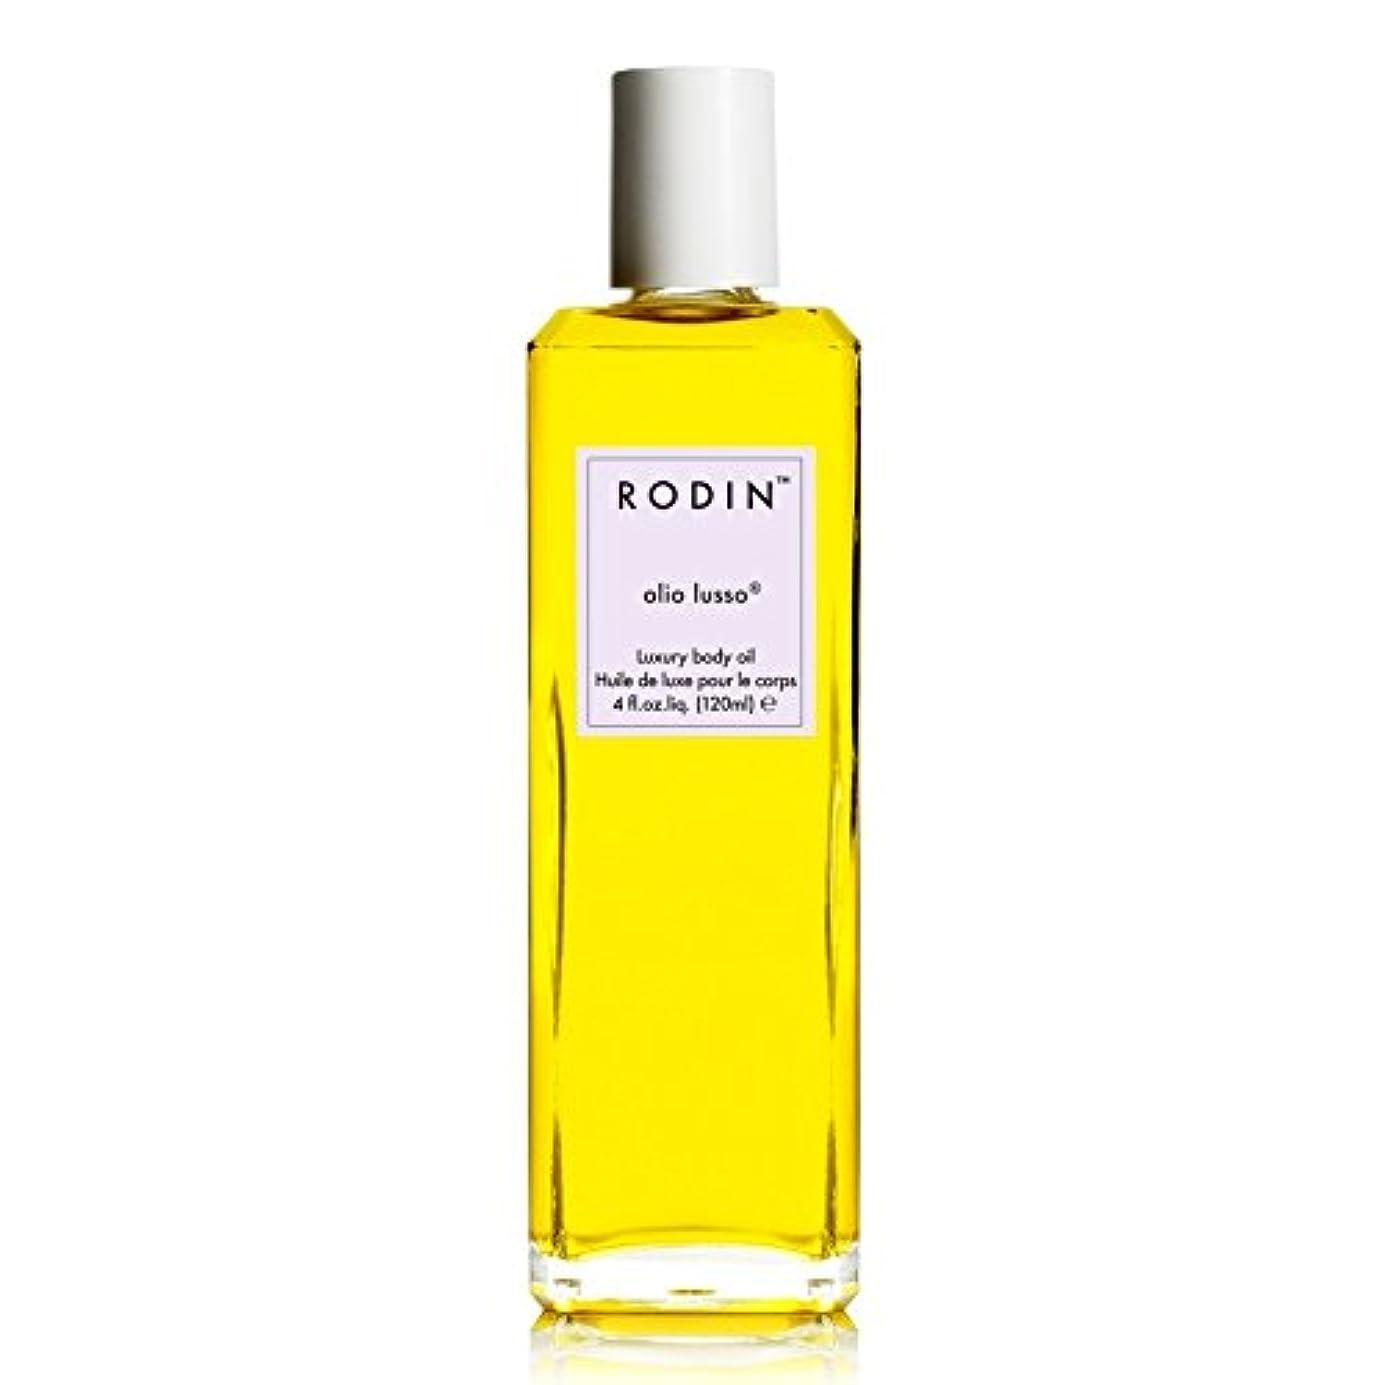 RODIN olio lusso Lavender Absolute Luxury Body Oil 30ml (Pack of 6) - ロダンルッソラベンダー絶対贅沢なボディオイル30ミリリットル x6 [並行輸入品]